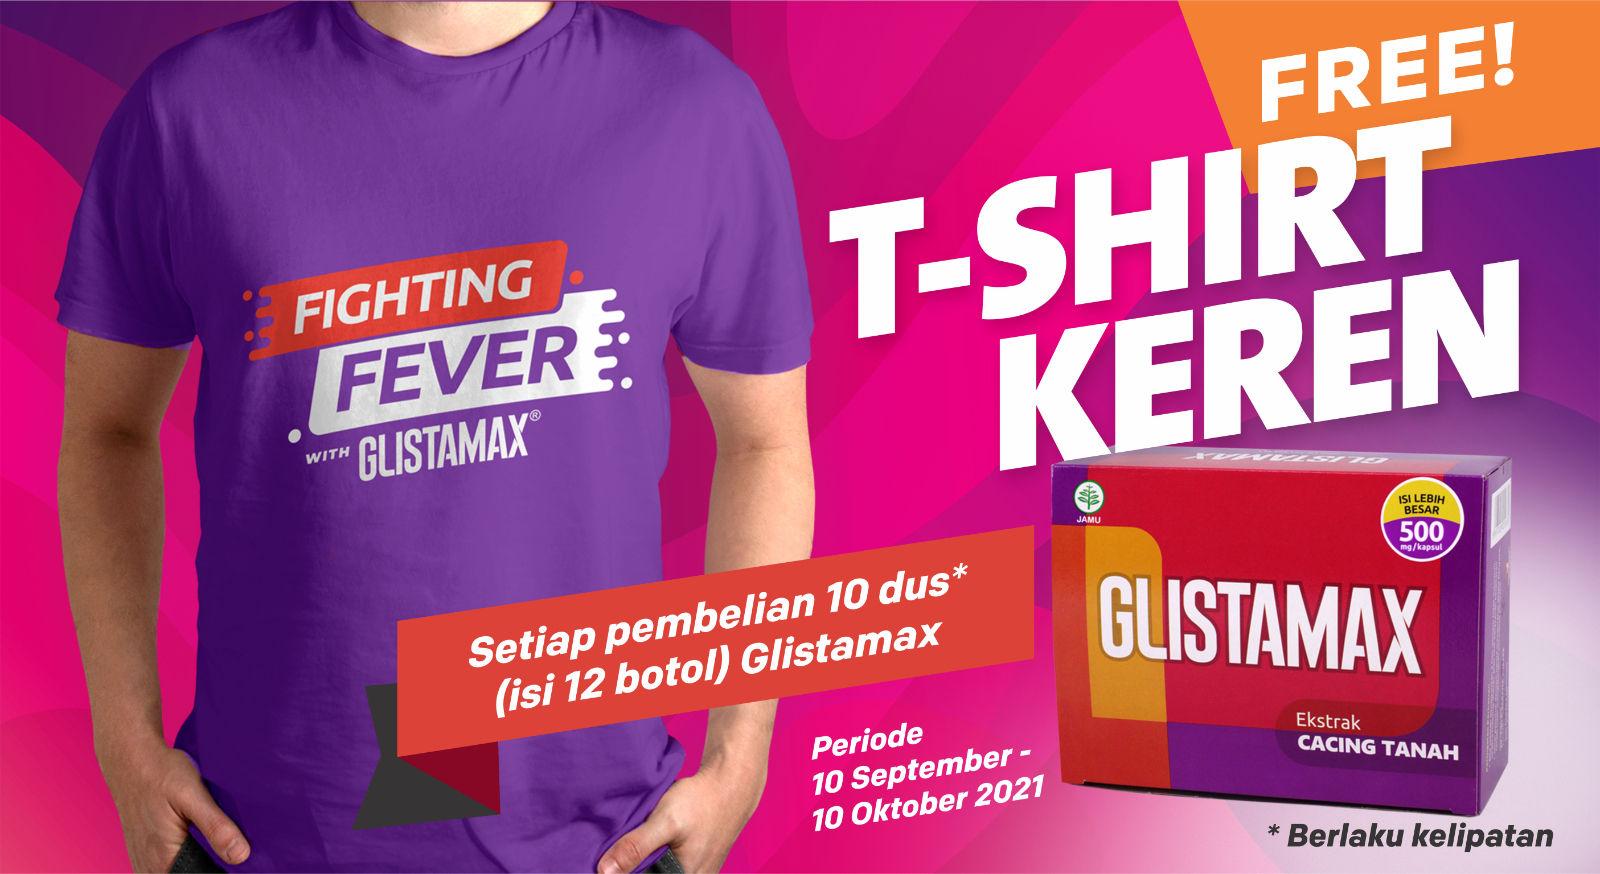 Free T-Shirt keren Glistamax